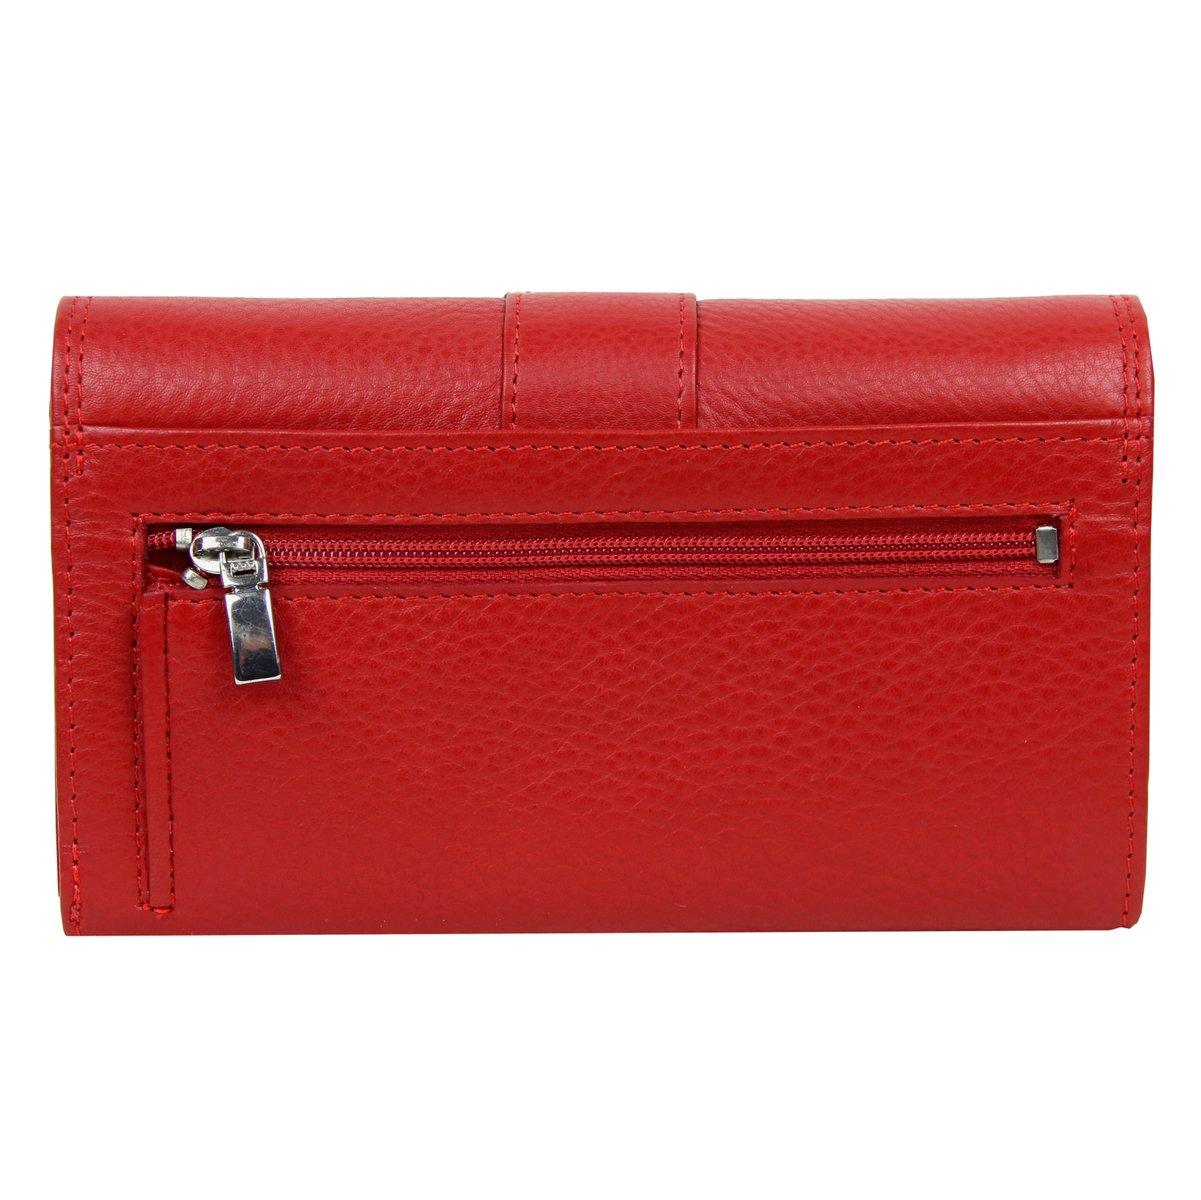 Geldbörse Portemonnaie Leder Damen Rot